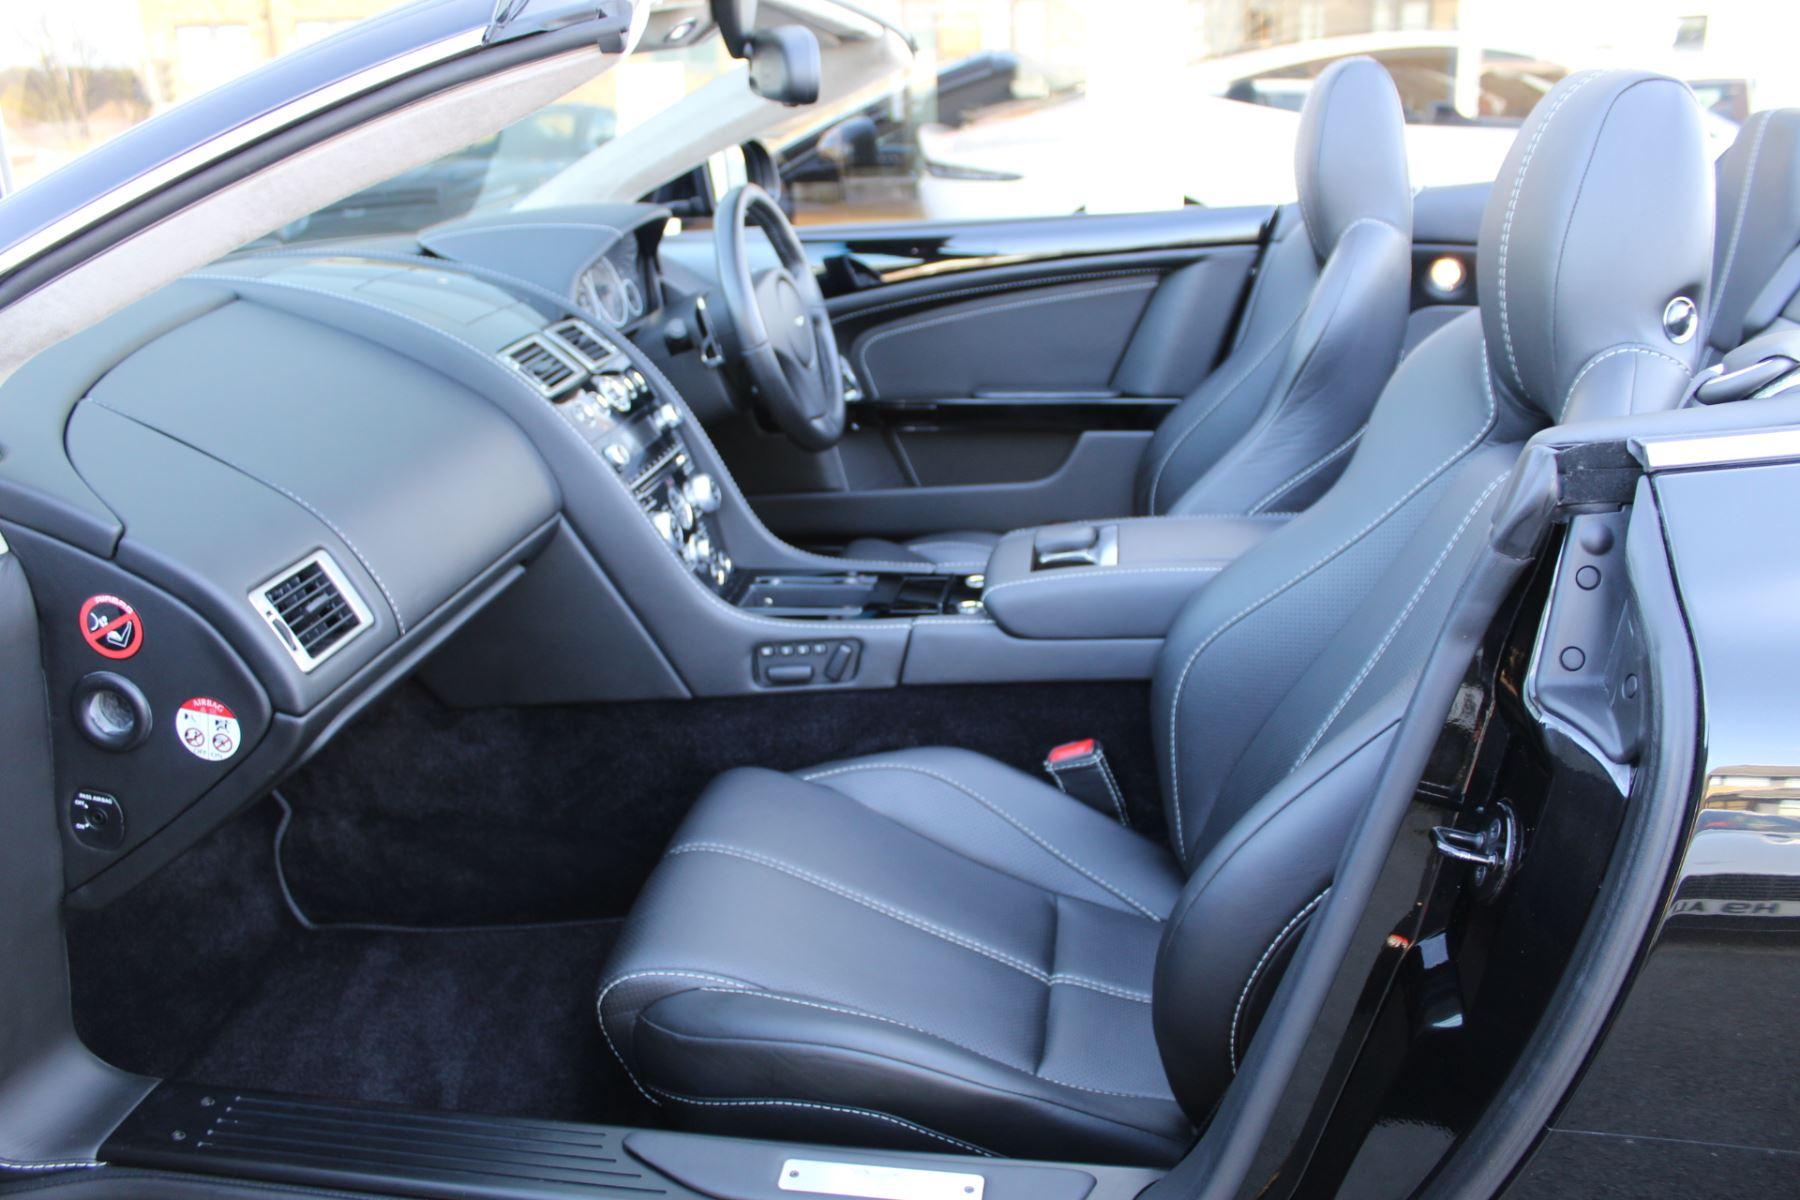 Aston Martin DB9 V12 2dr Volante Touchtronic [470] image 10